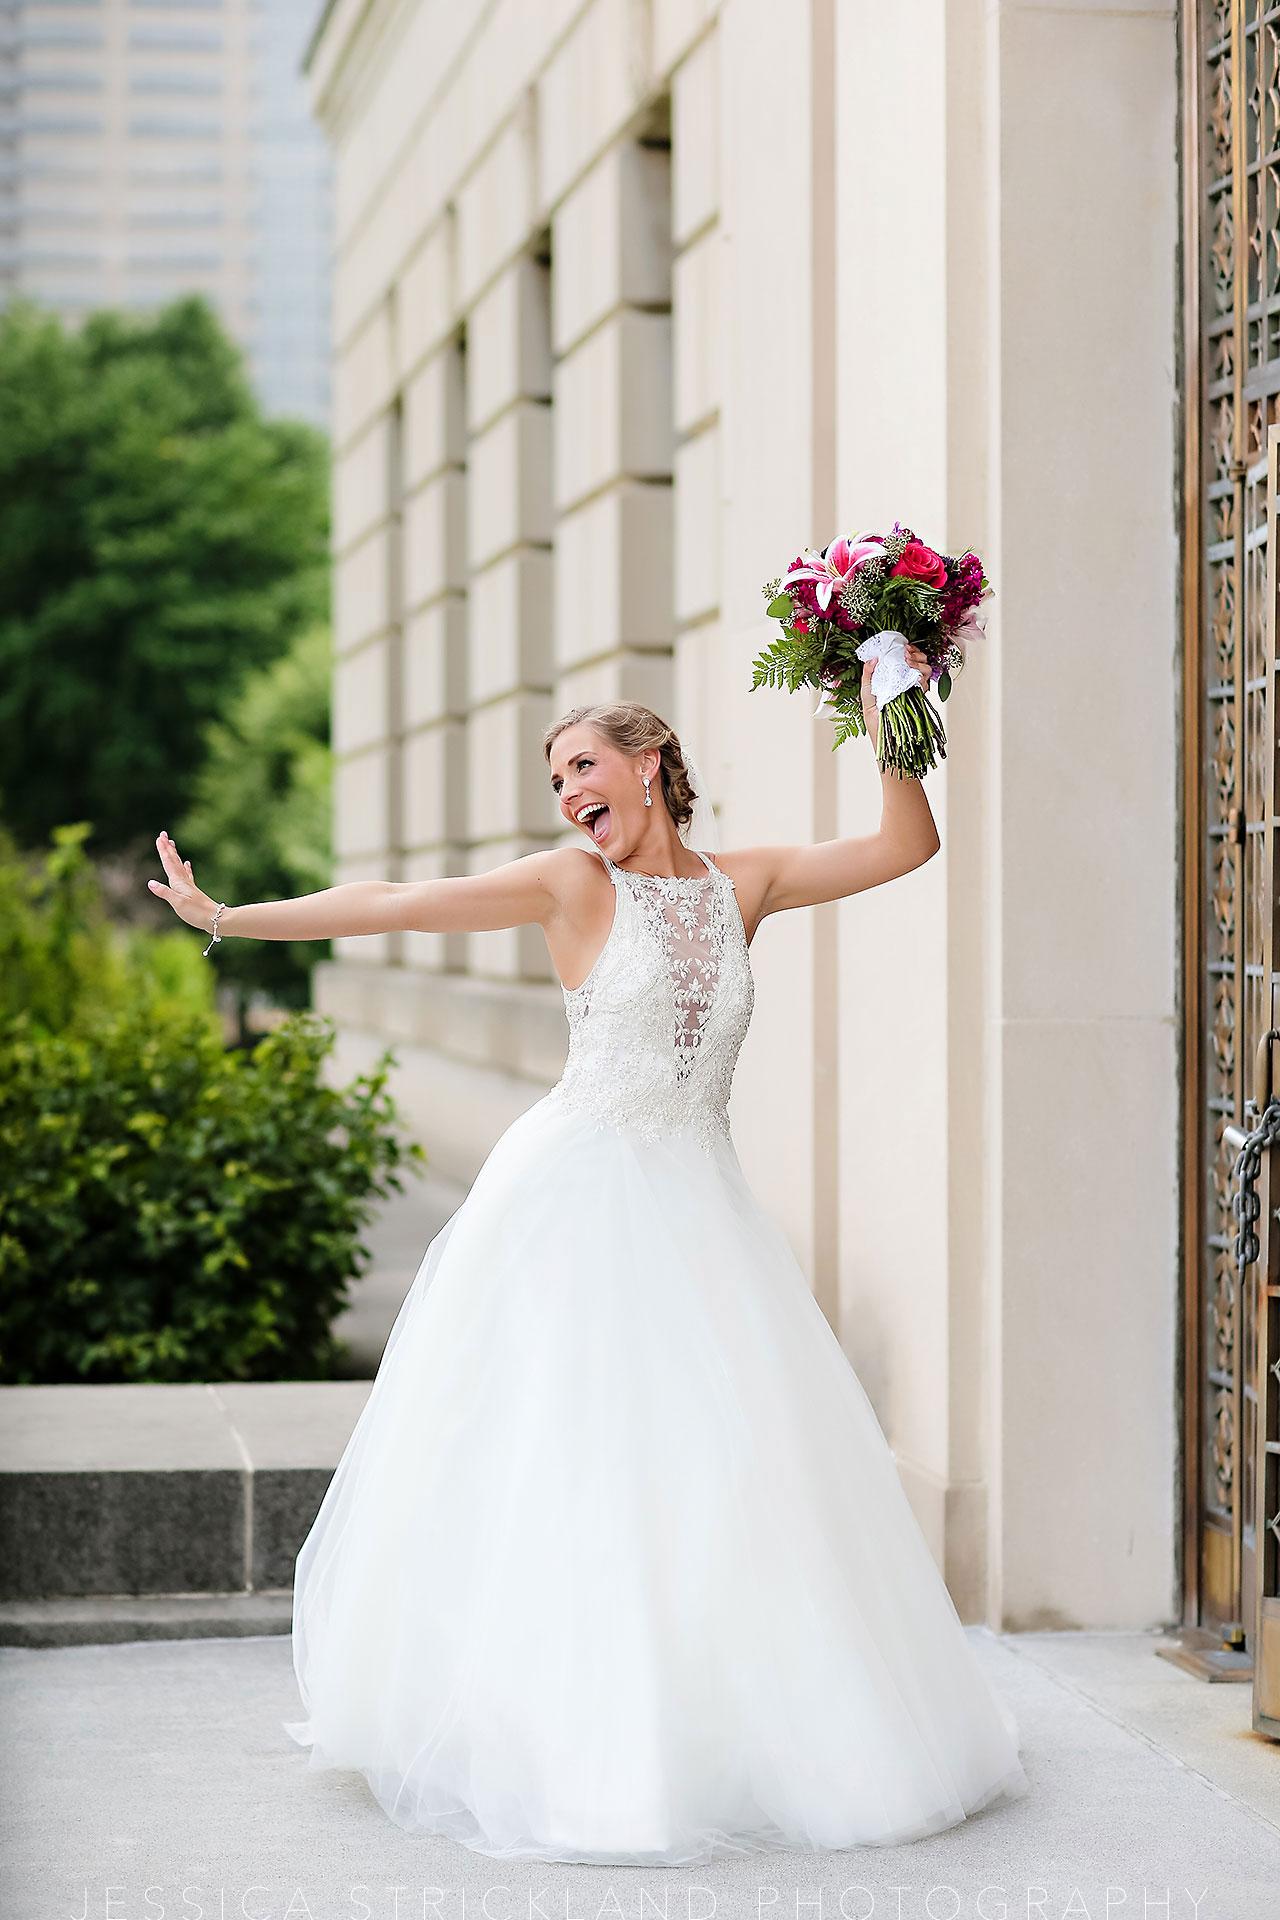 Serra Alex Regions Tower Indianapolis Wedding 107 watermarked